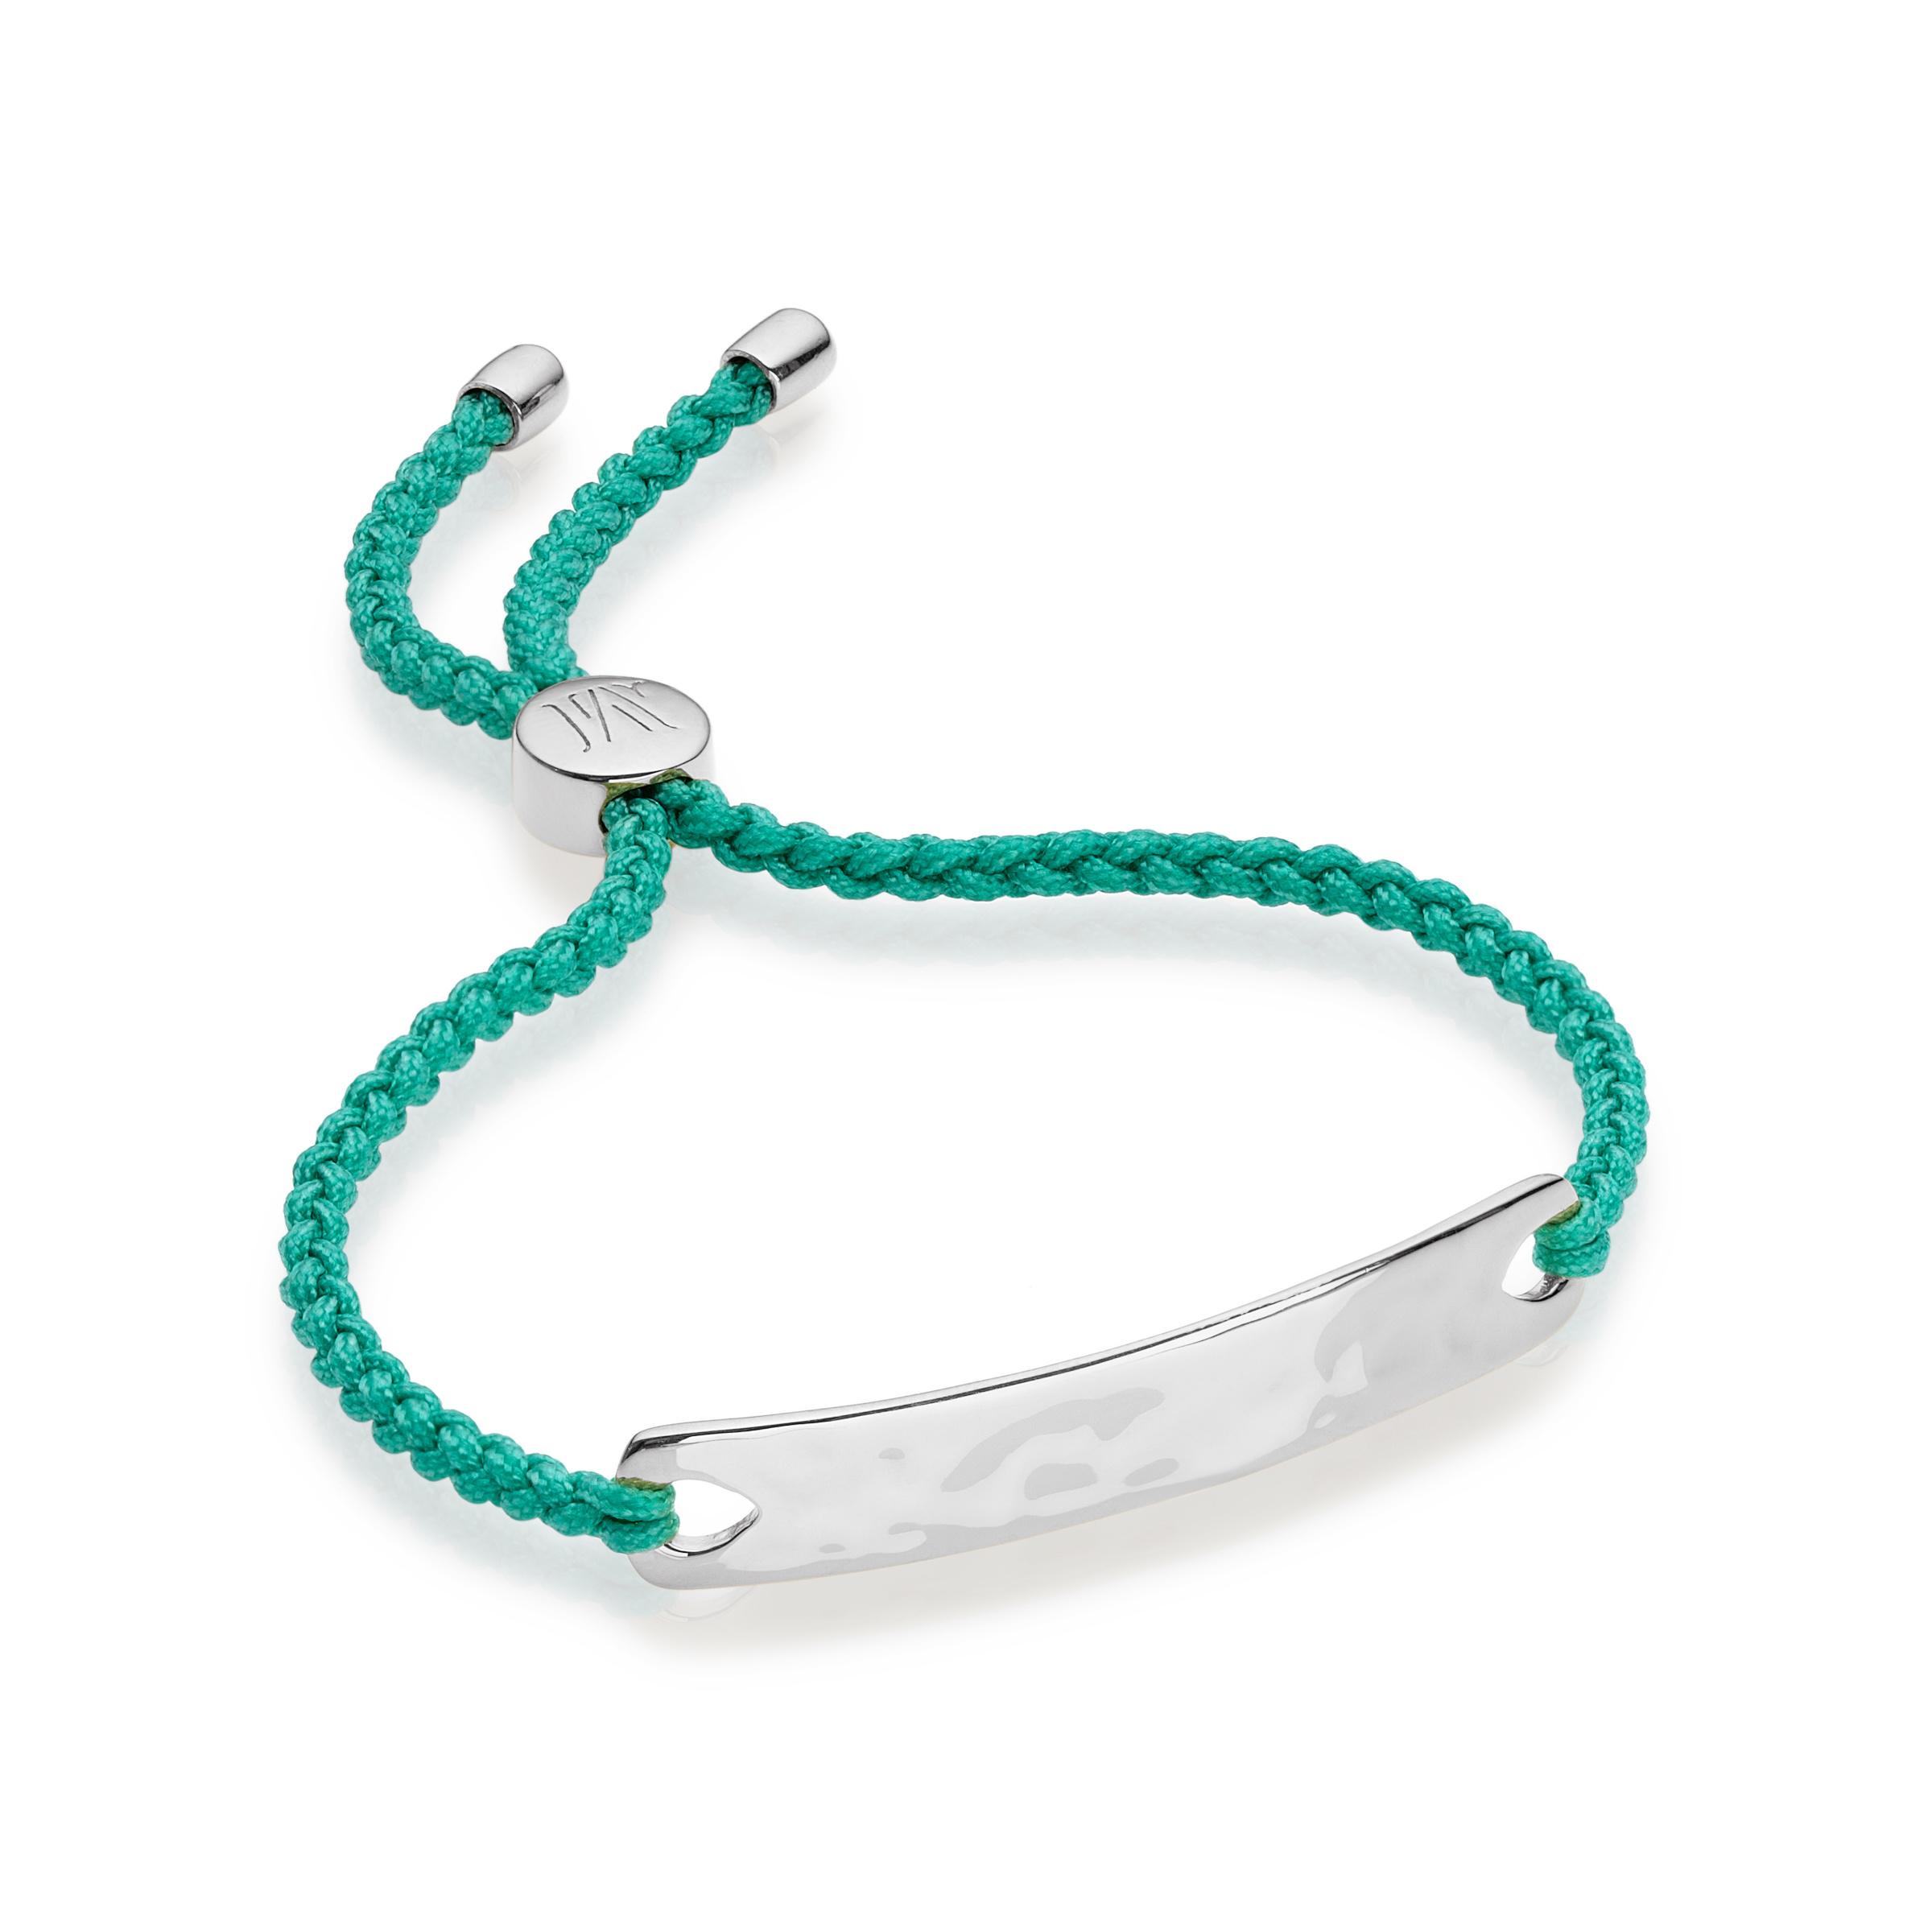 vinader friendship bracelet in metallic lyst